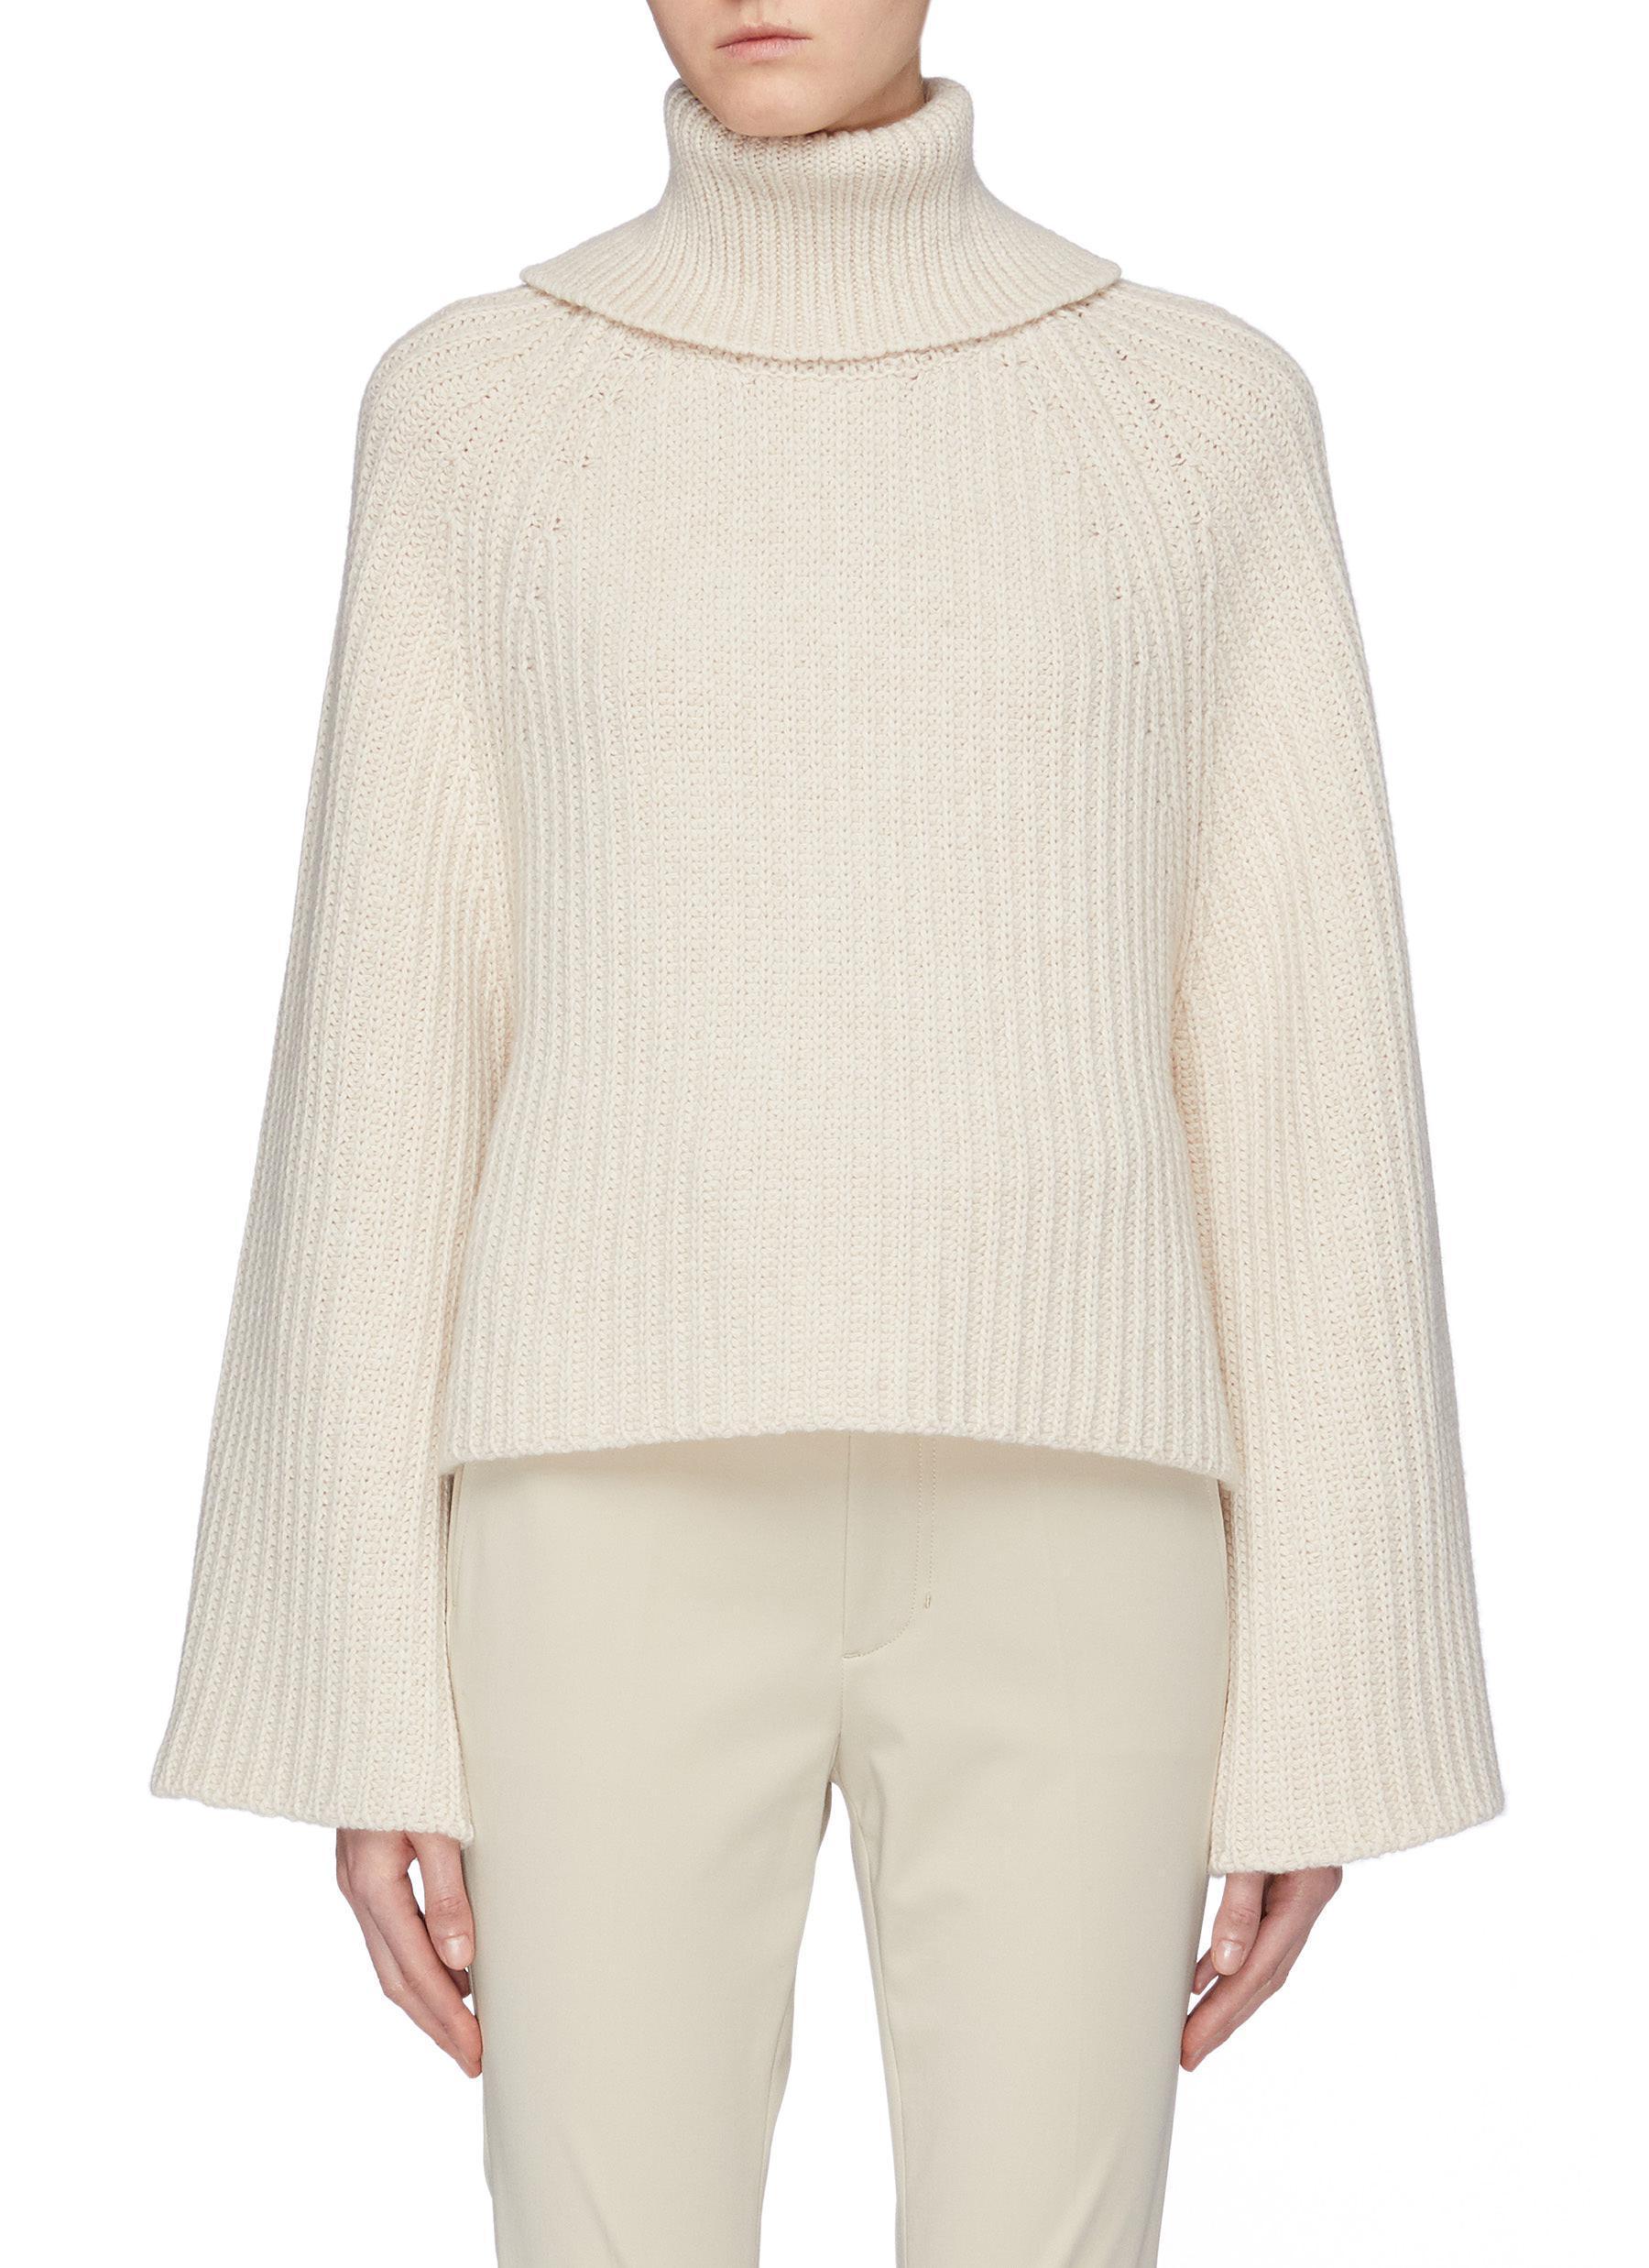 dd518174b3ca75 Rosetta Getty. Women s Natural Open Back Wool-cashmere Rib Knit Turtleneck  Sweater